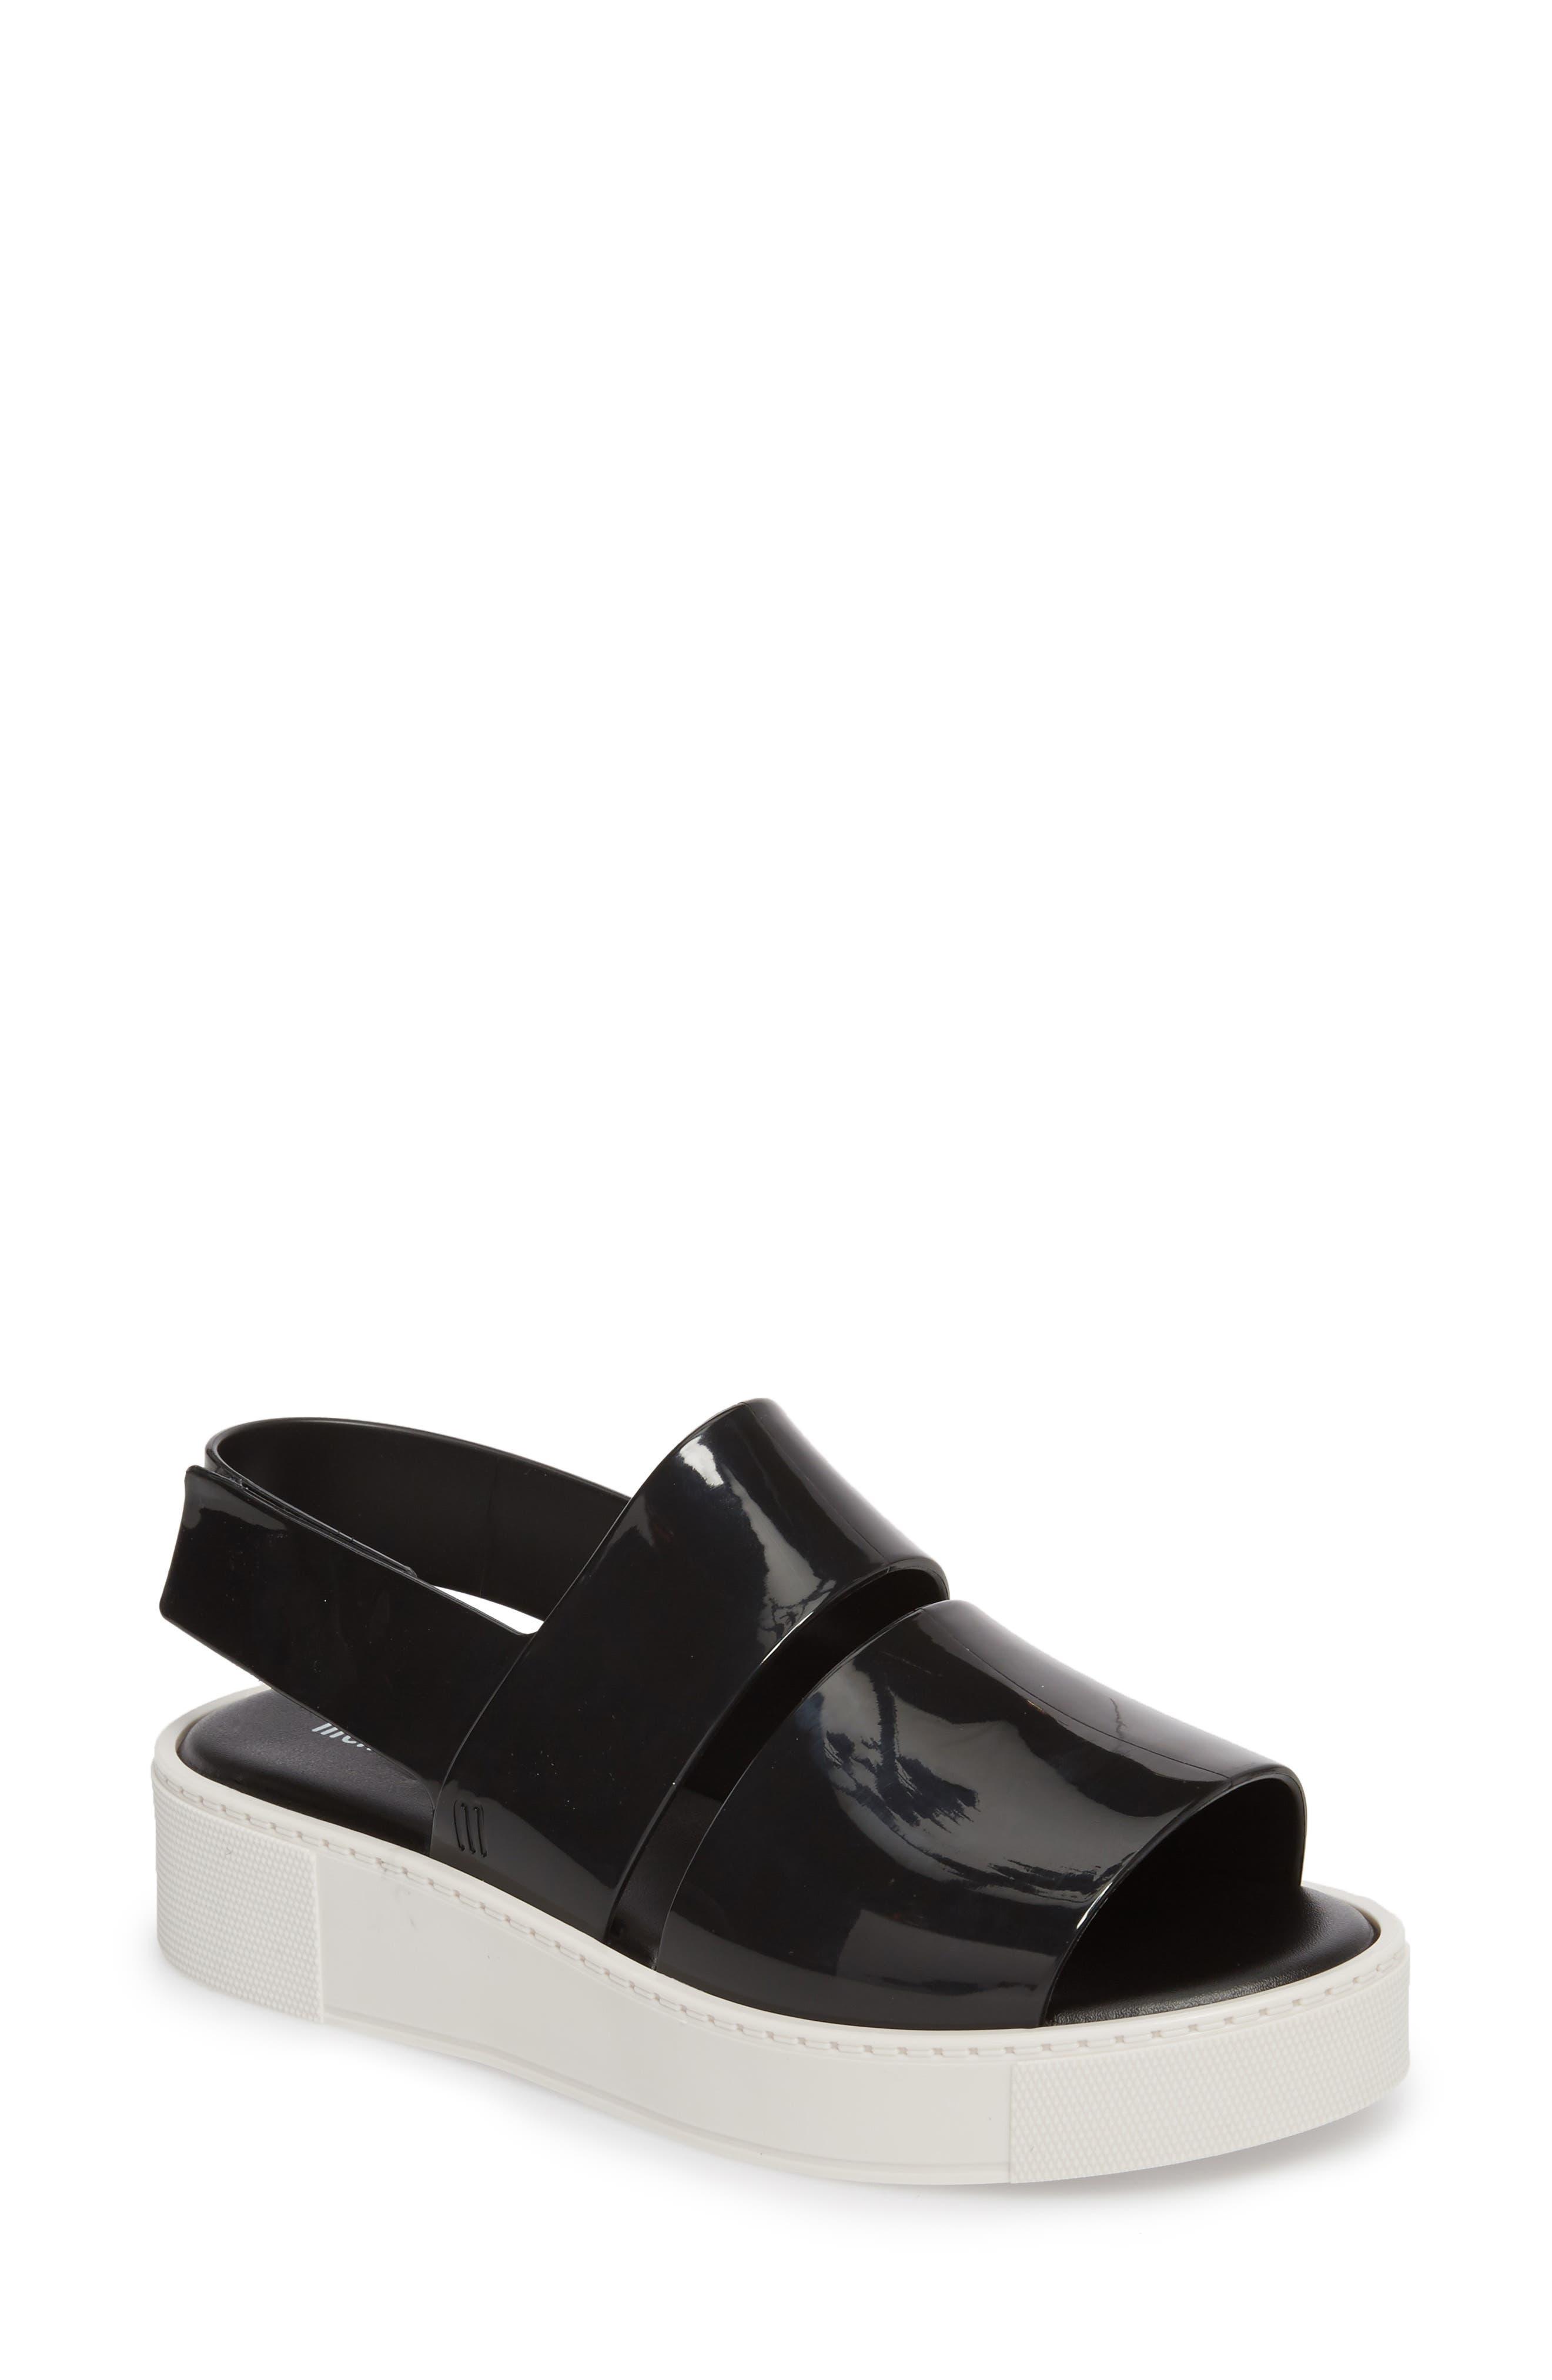 Soho Platform Sandal,                         Main,                         color,